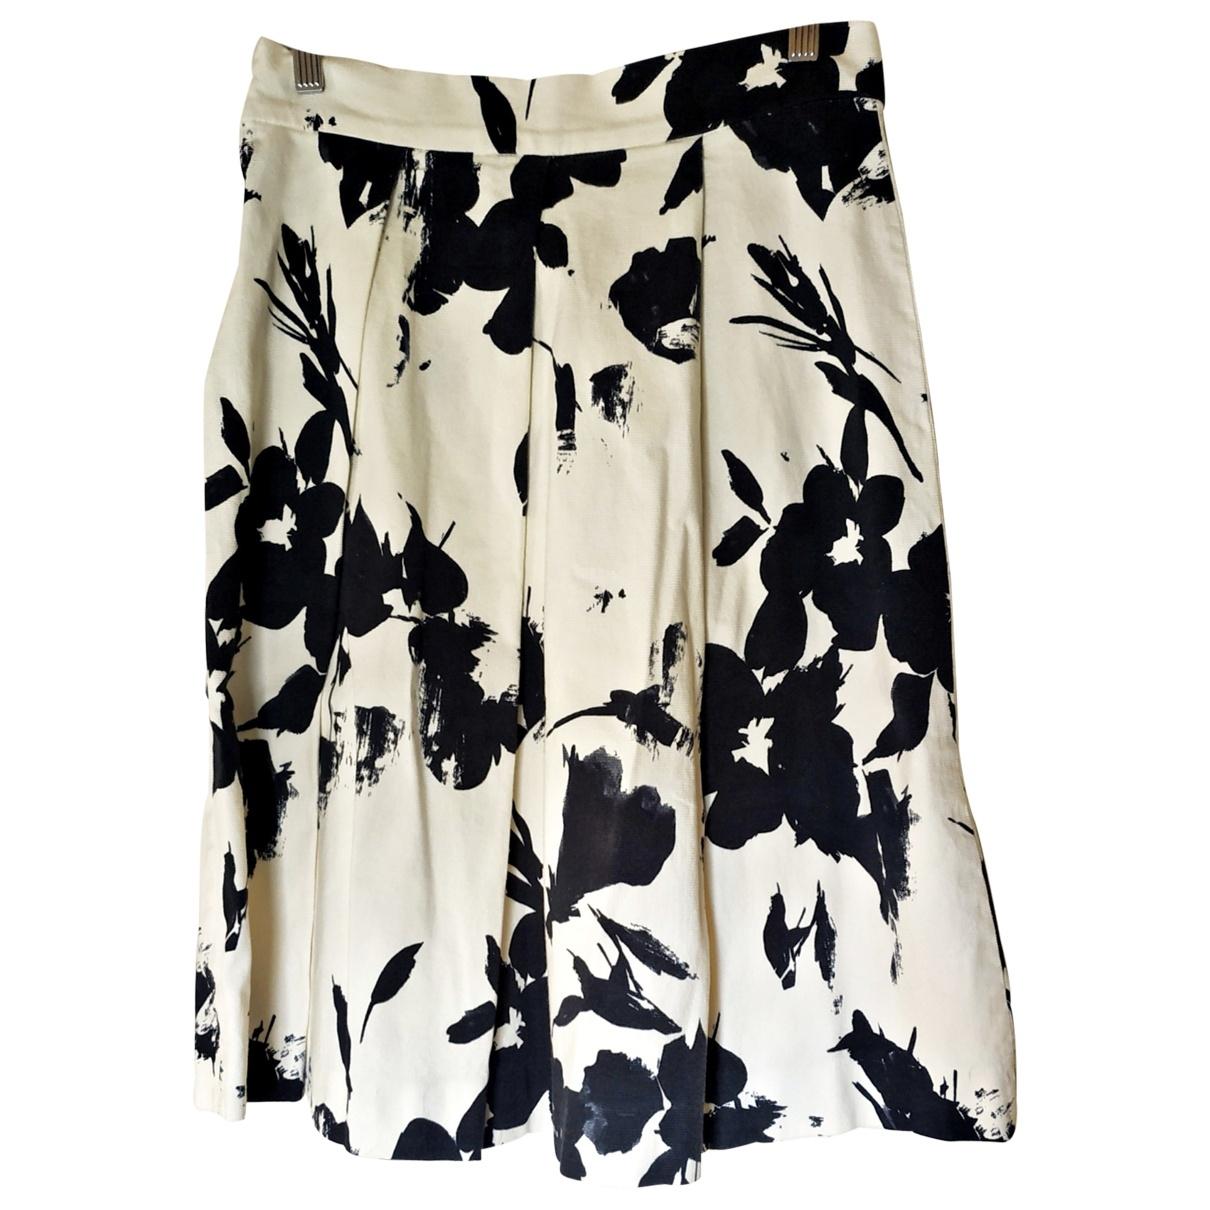 Zara \N Ecru Cotton skirt for Women L International